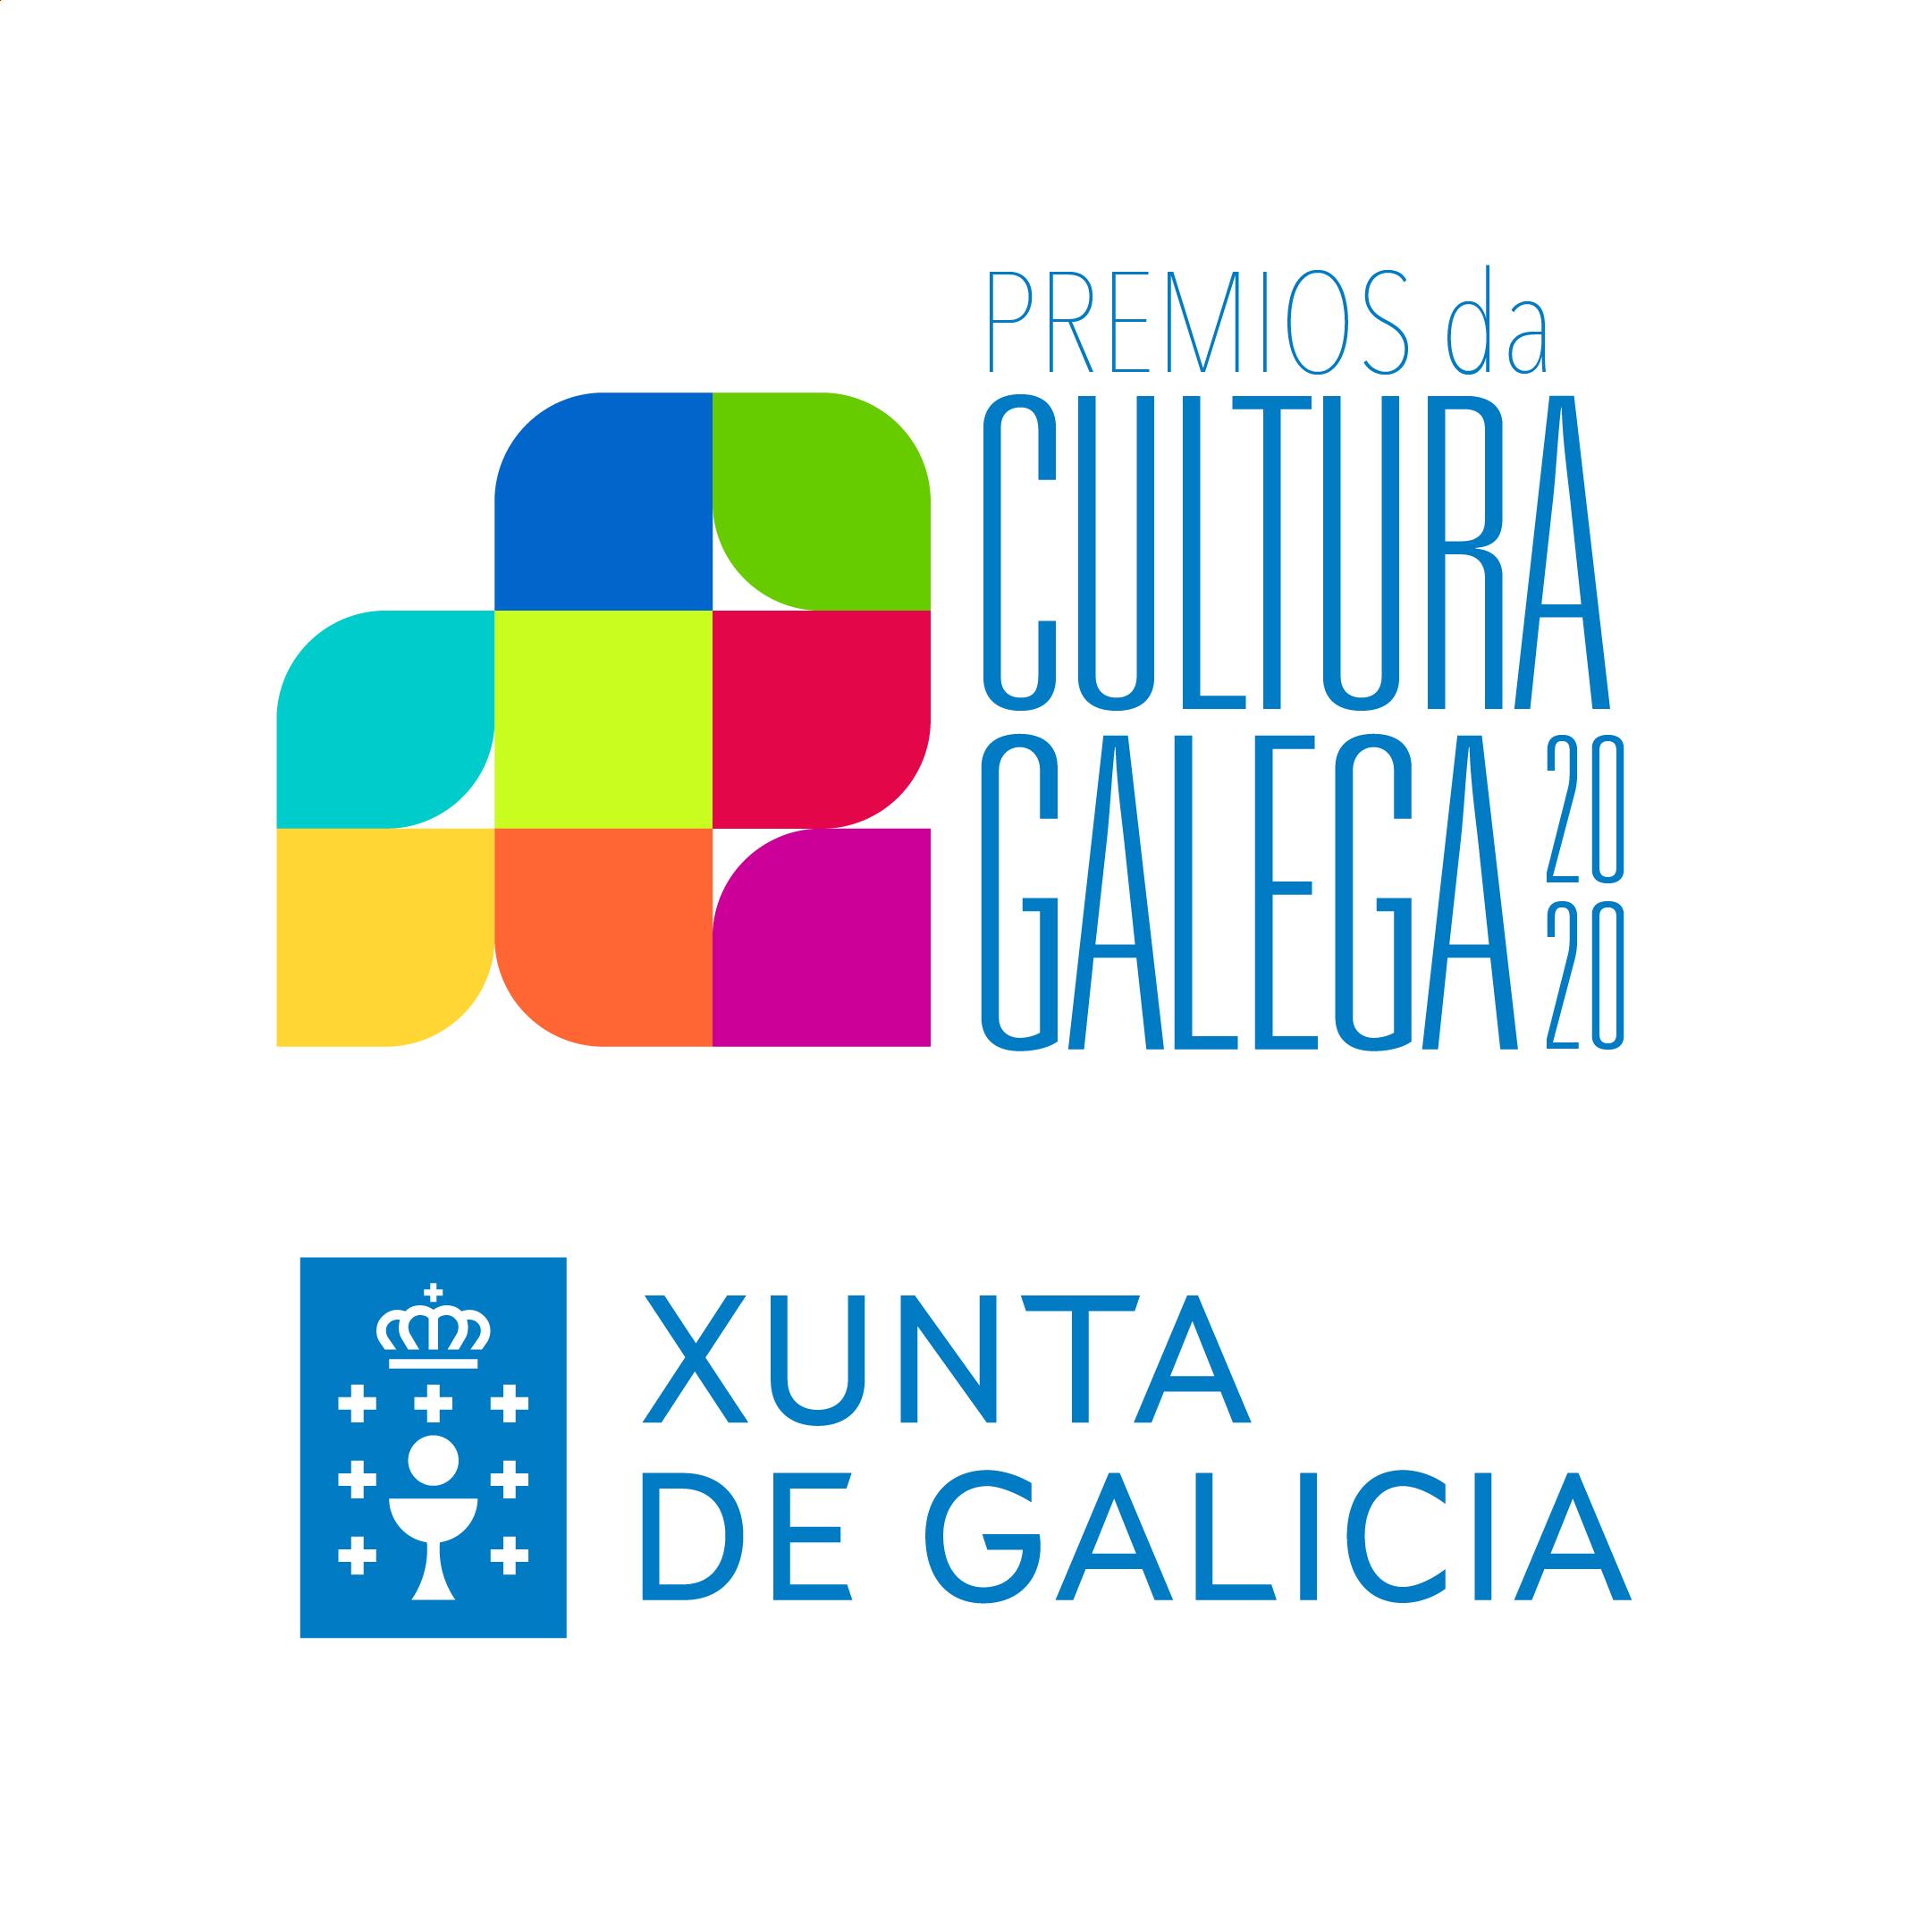 Logotipo Premios da Cultura Galega 2020